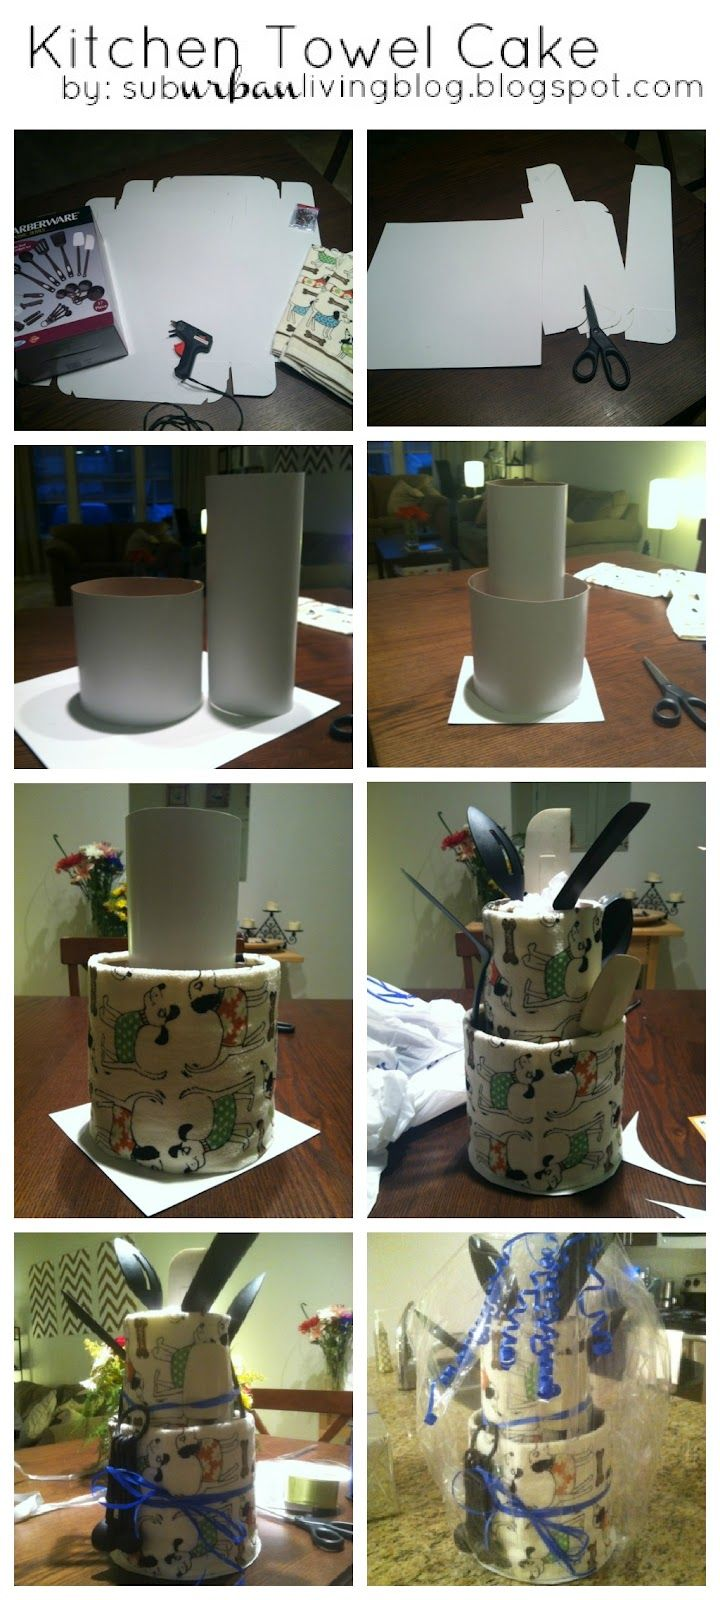 Gift Kitchen 17 Best Ideas About Kitchen Towel Cakes On Pinterest Kitchen